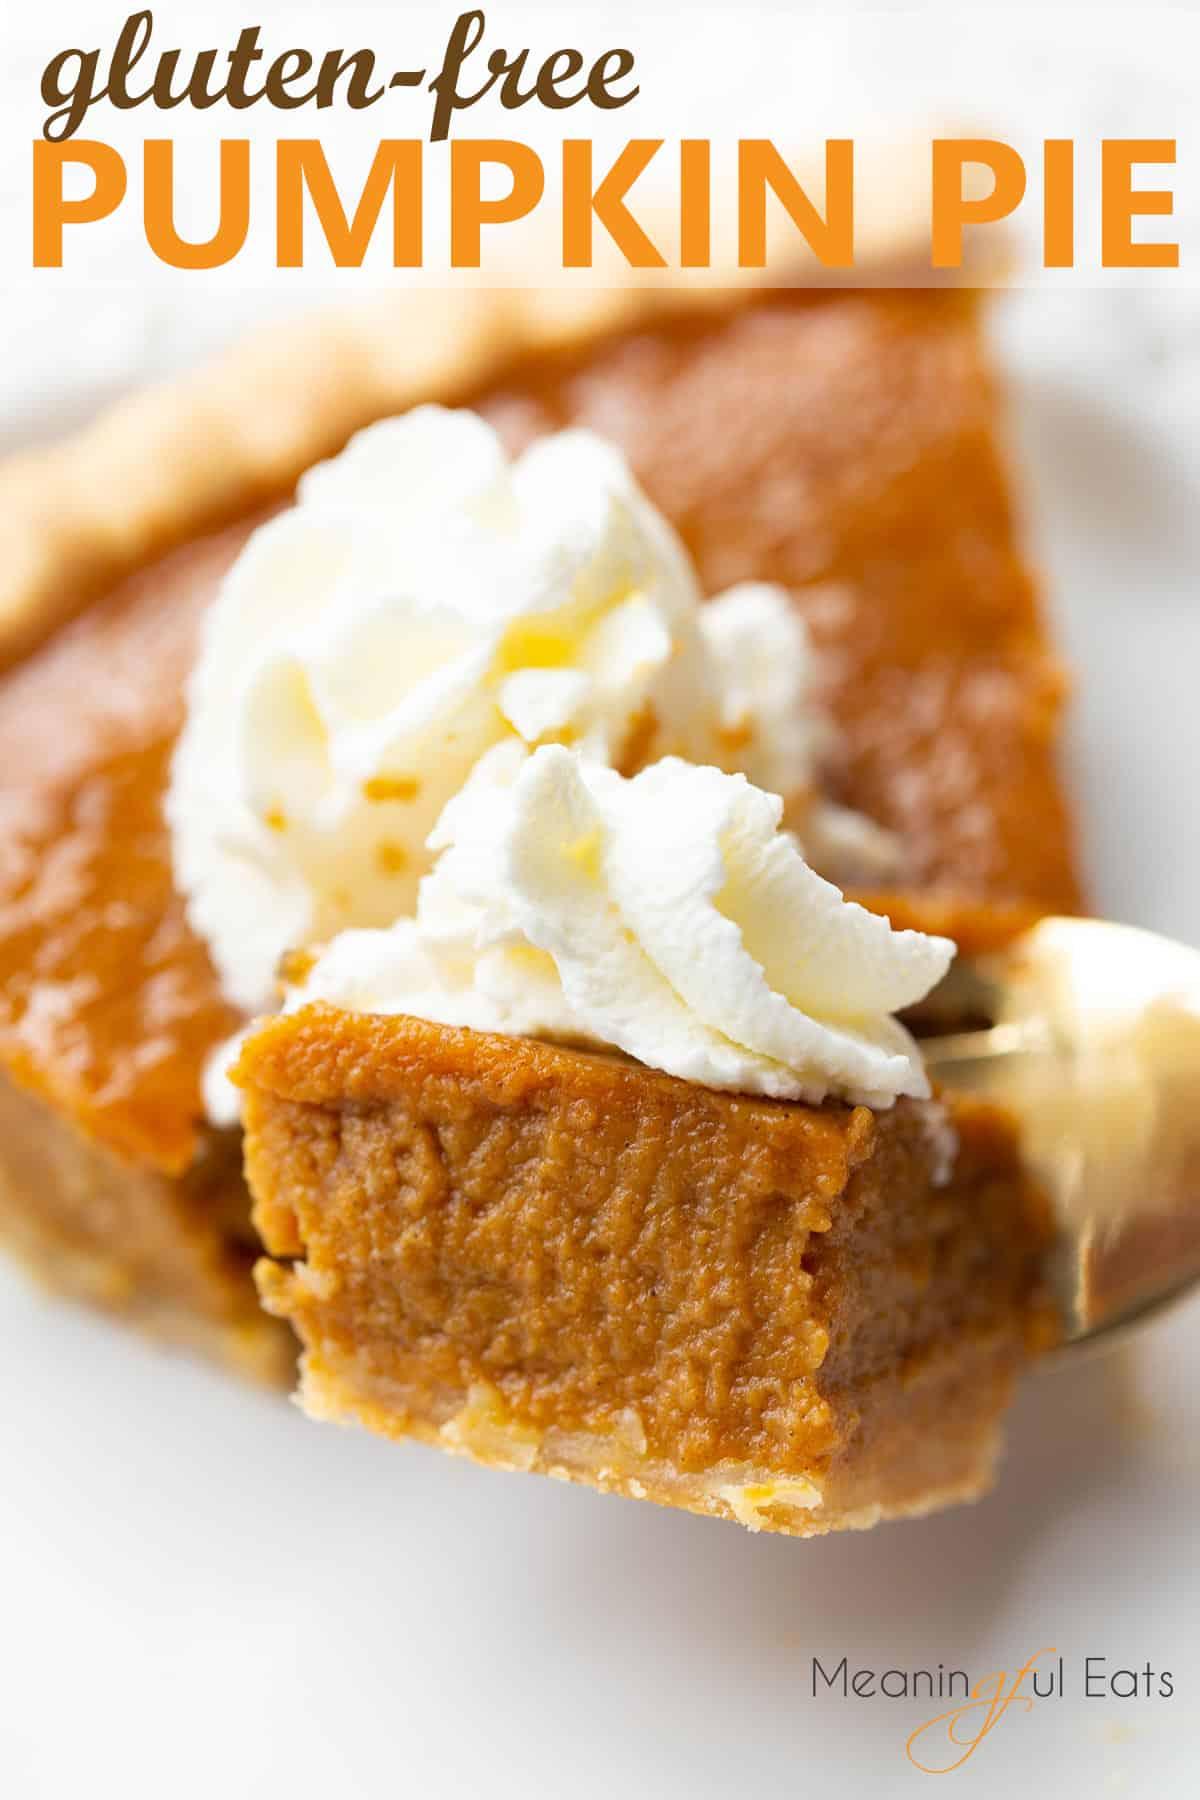 Image for pinterest of pumpkin pie